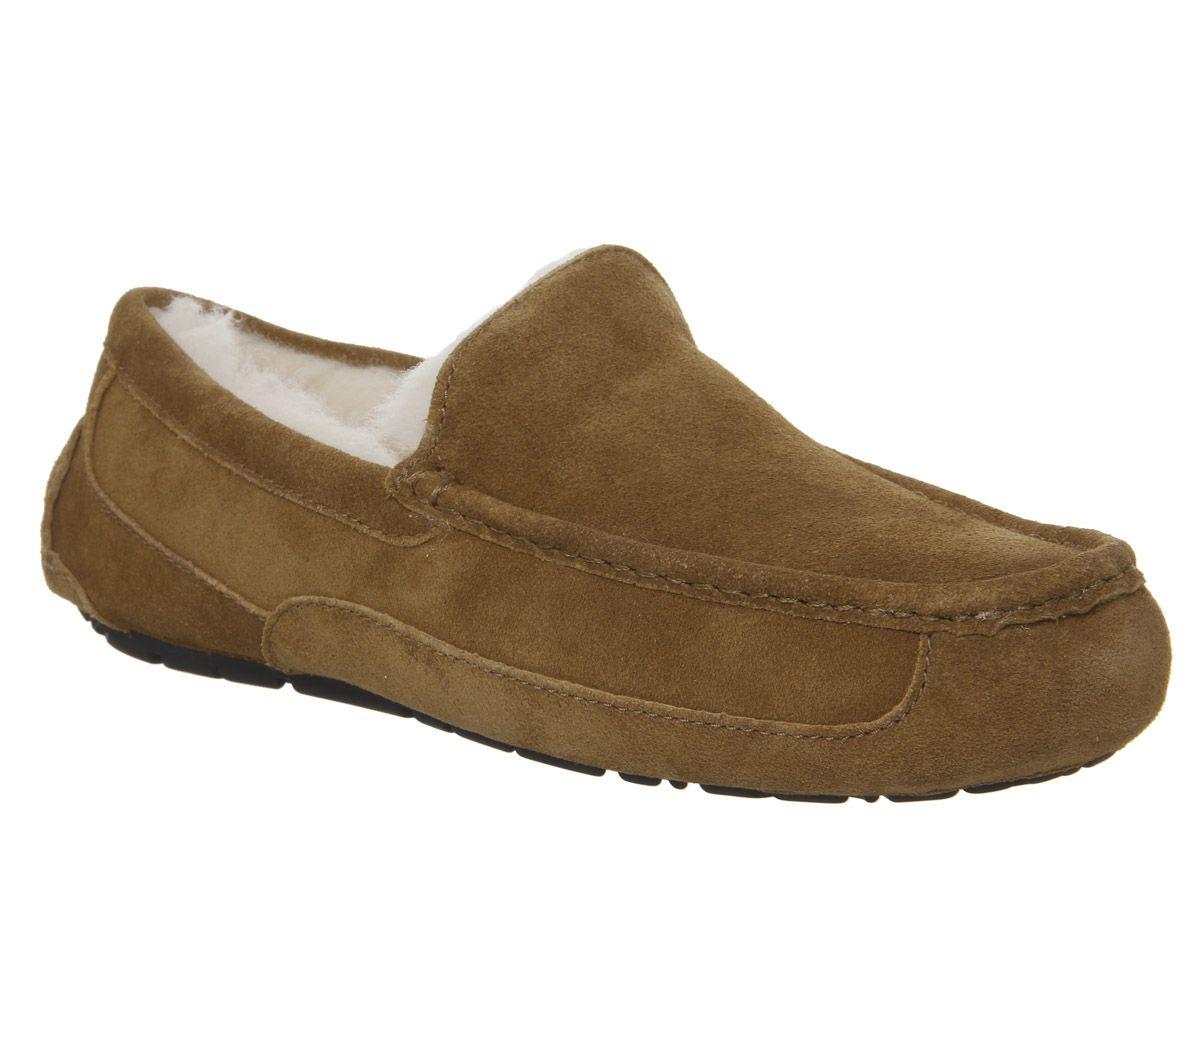 d5eafdb90b2 Ascot Slippers